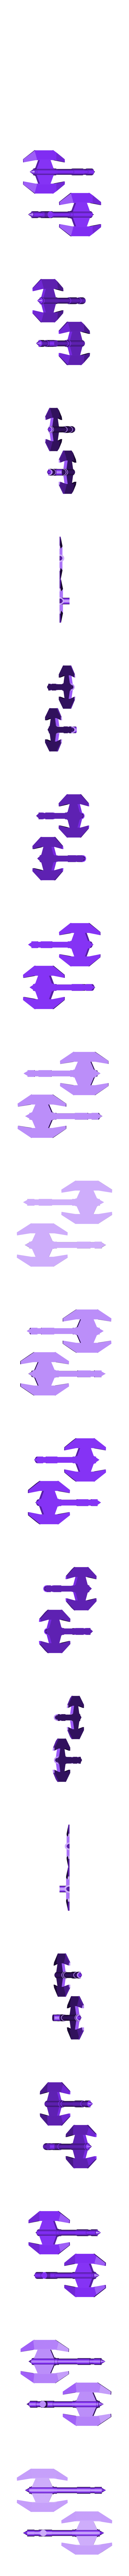 Split_Axe.stl Download free STL file Modular Mech SteamPunk • Design to 3D print, mrhers2